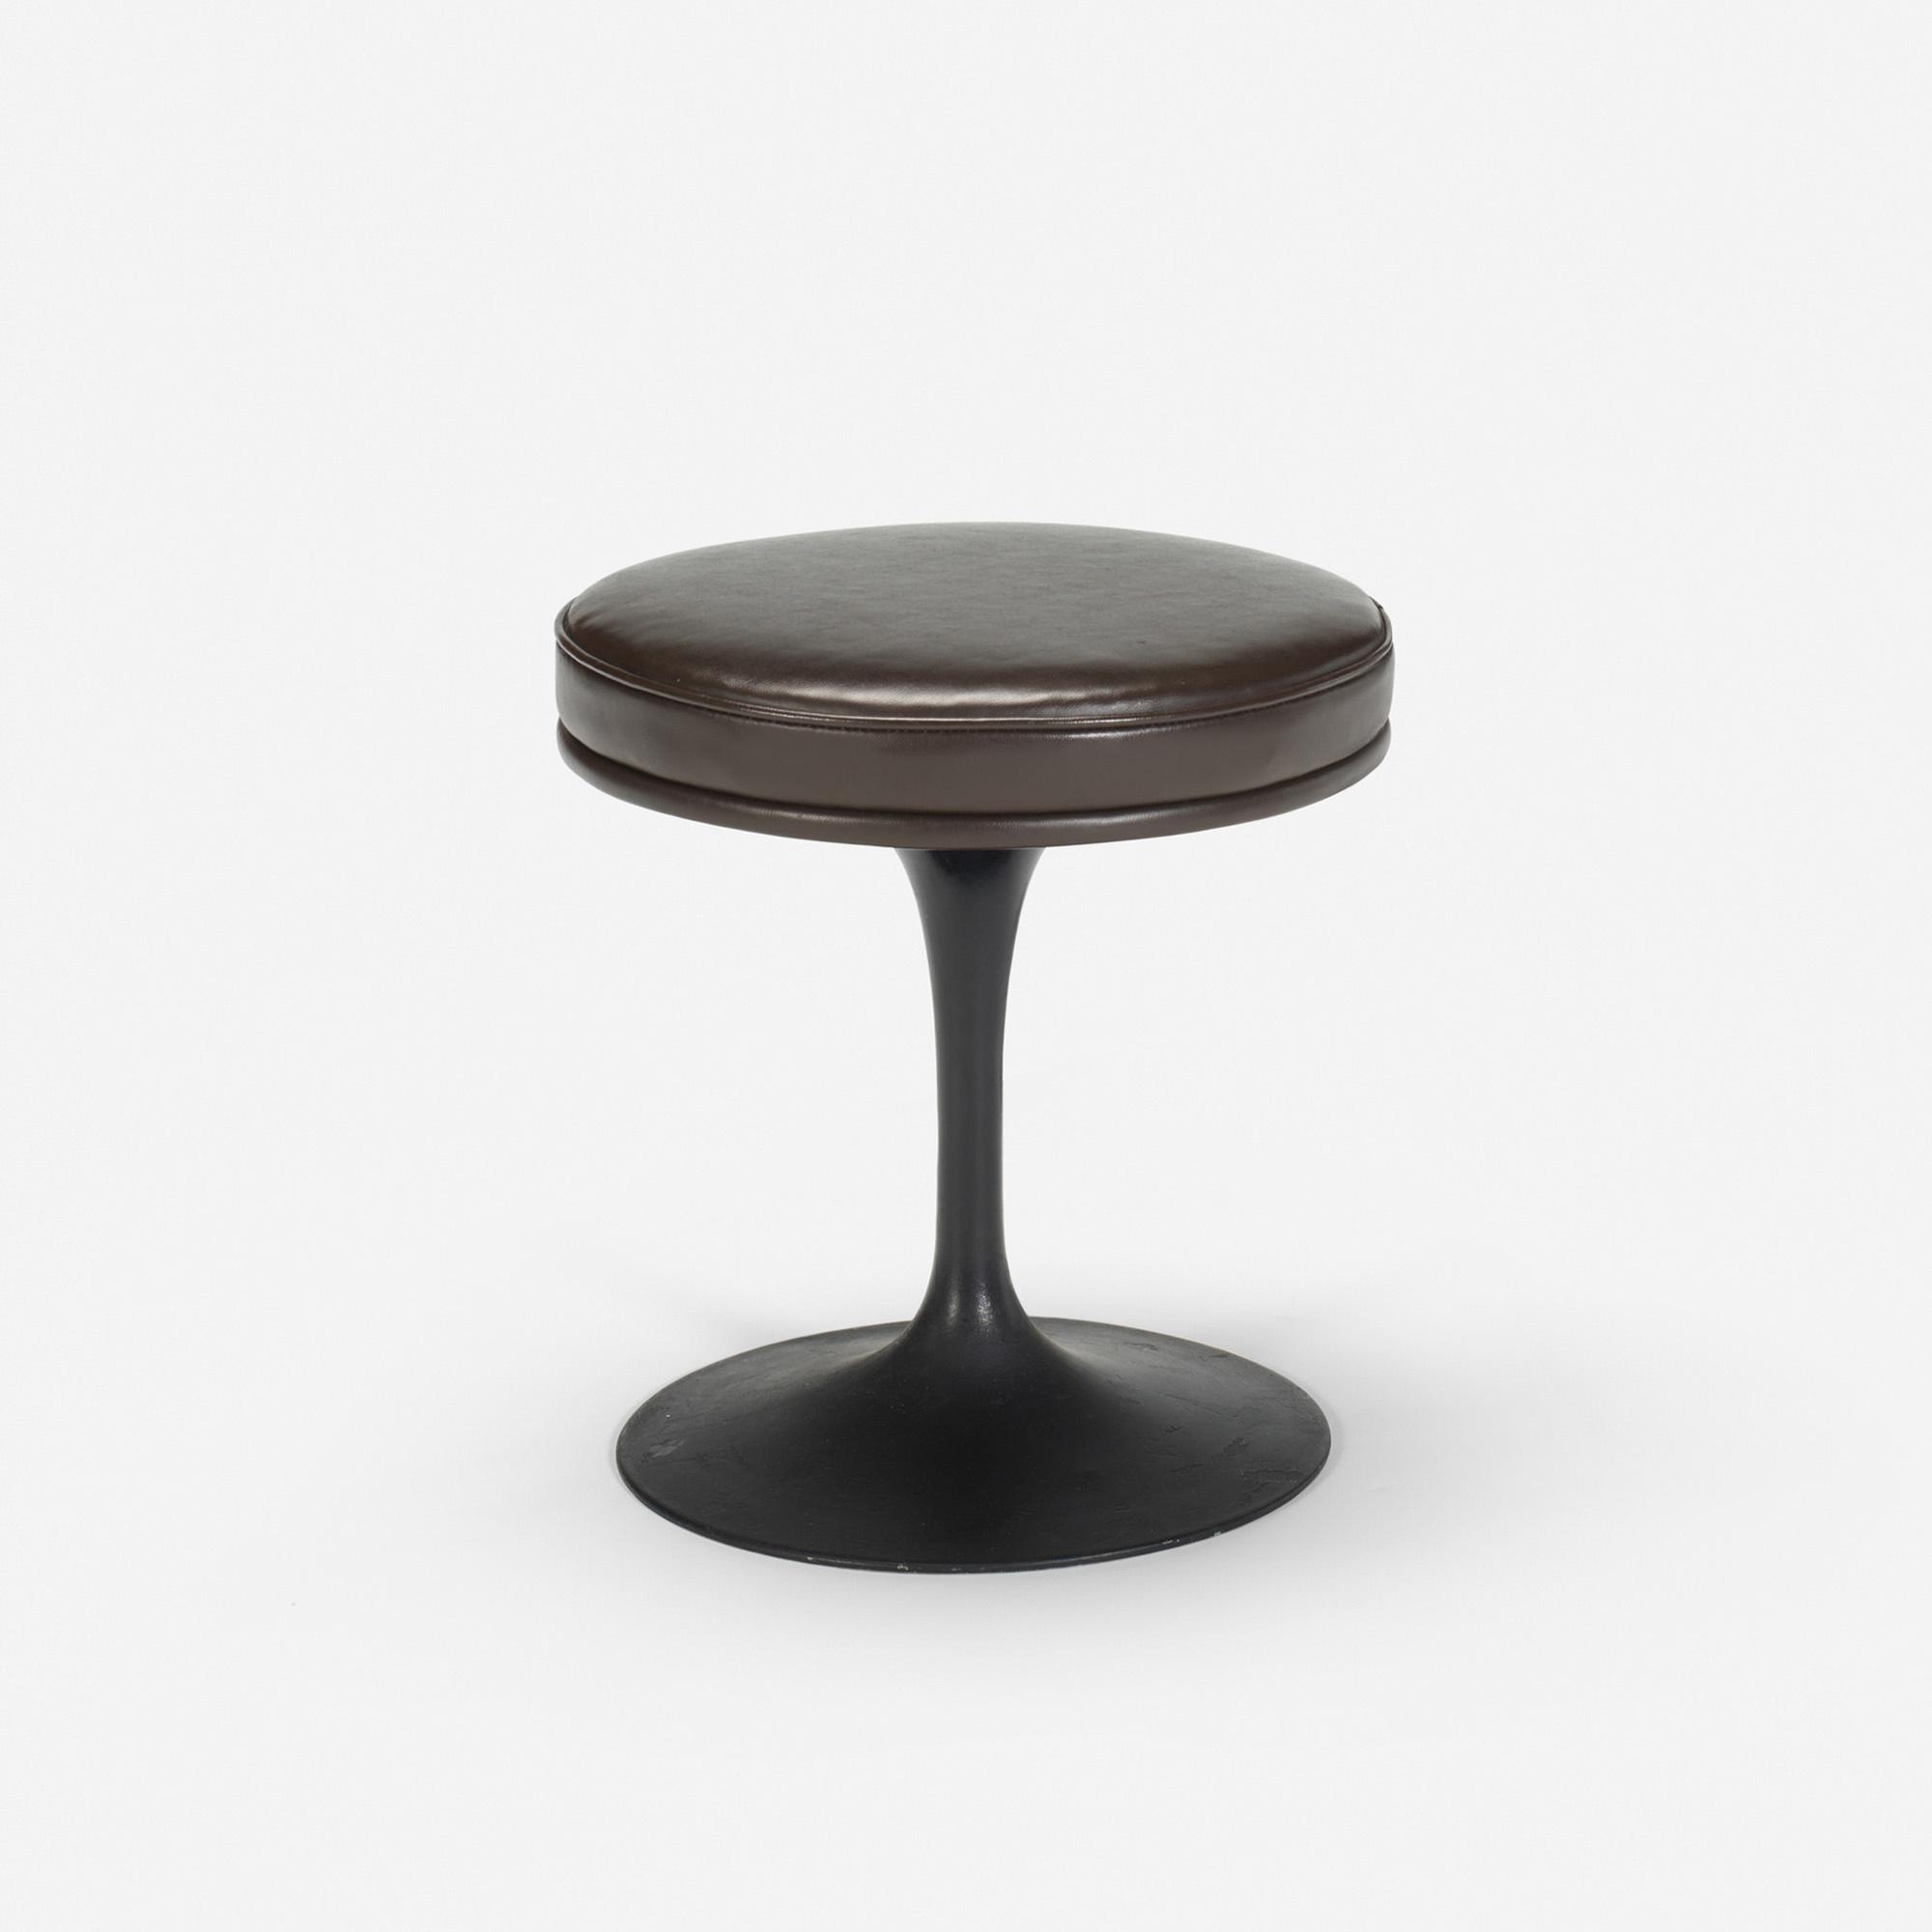 132: Eero Saarinen / Tulip stool from the bar of the Grill Room (1 of 1)